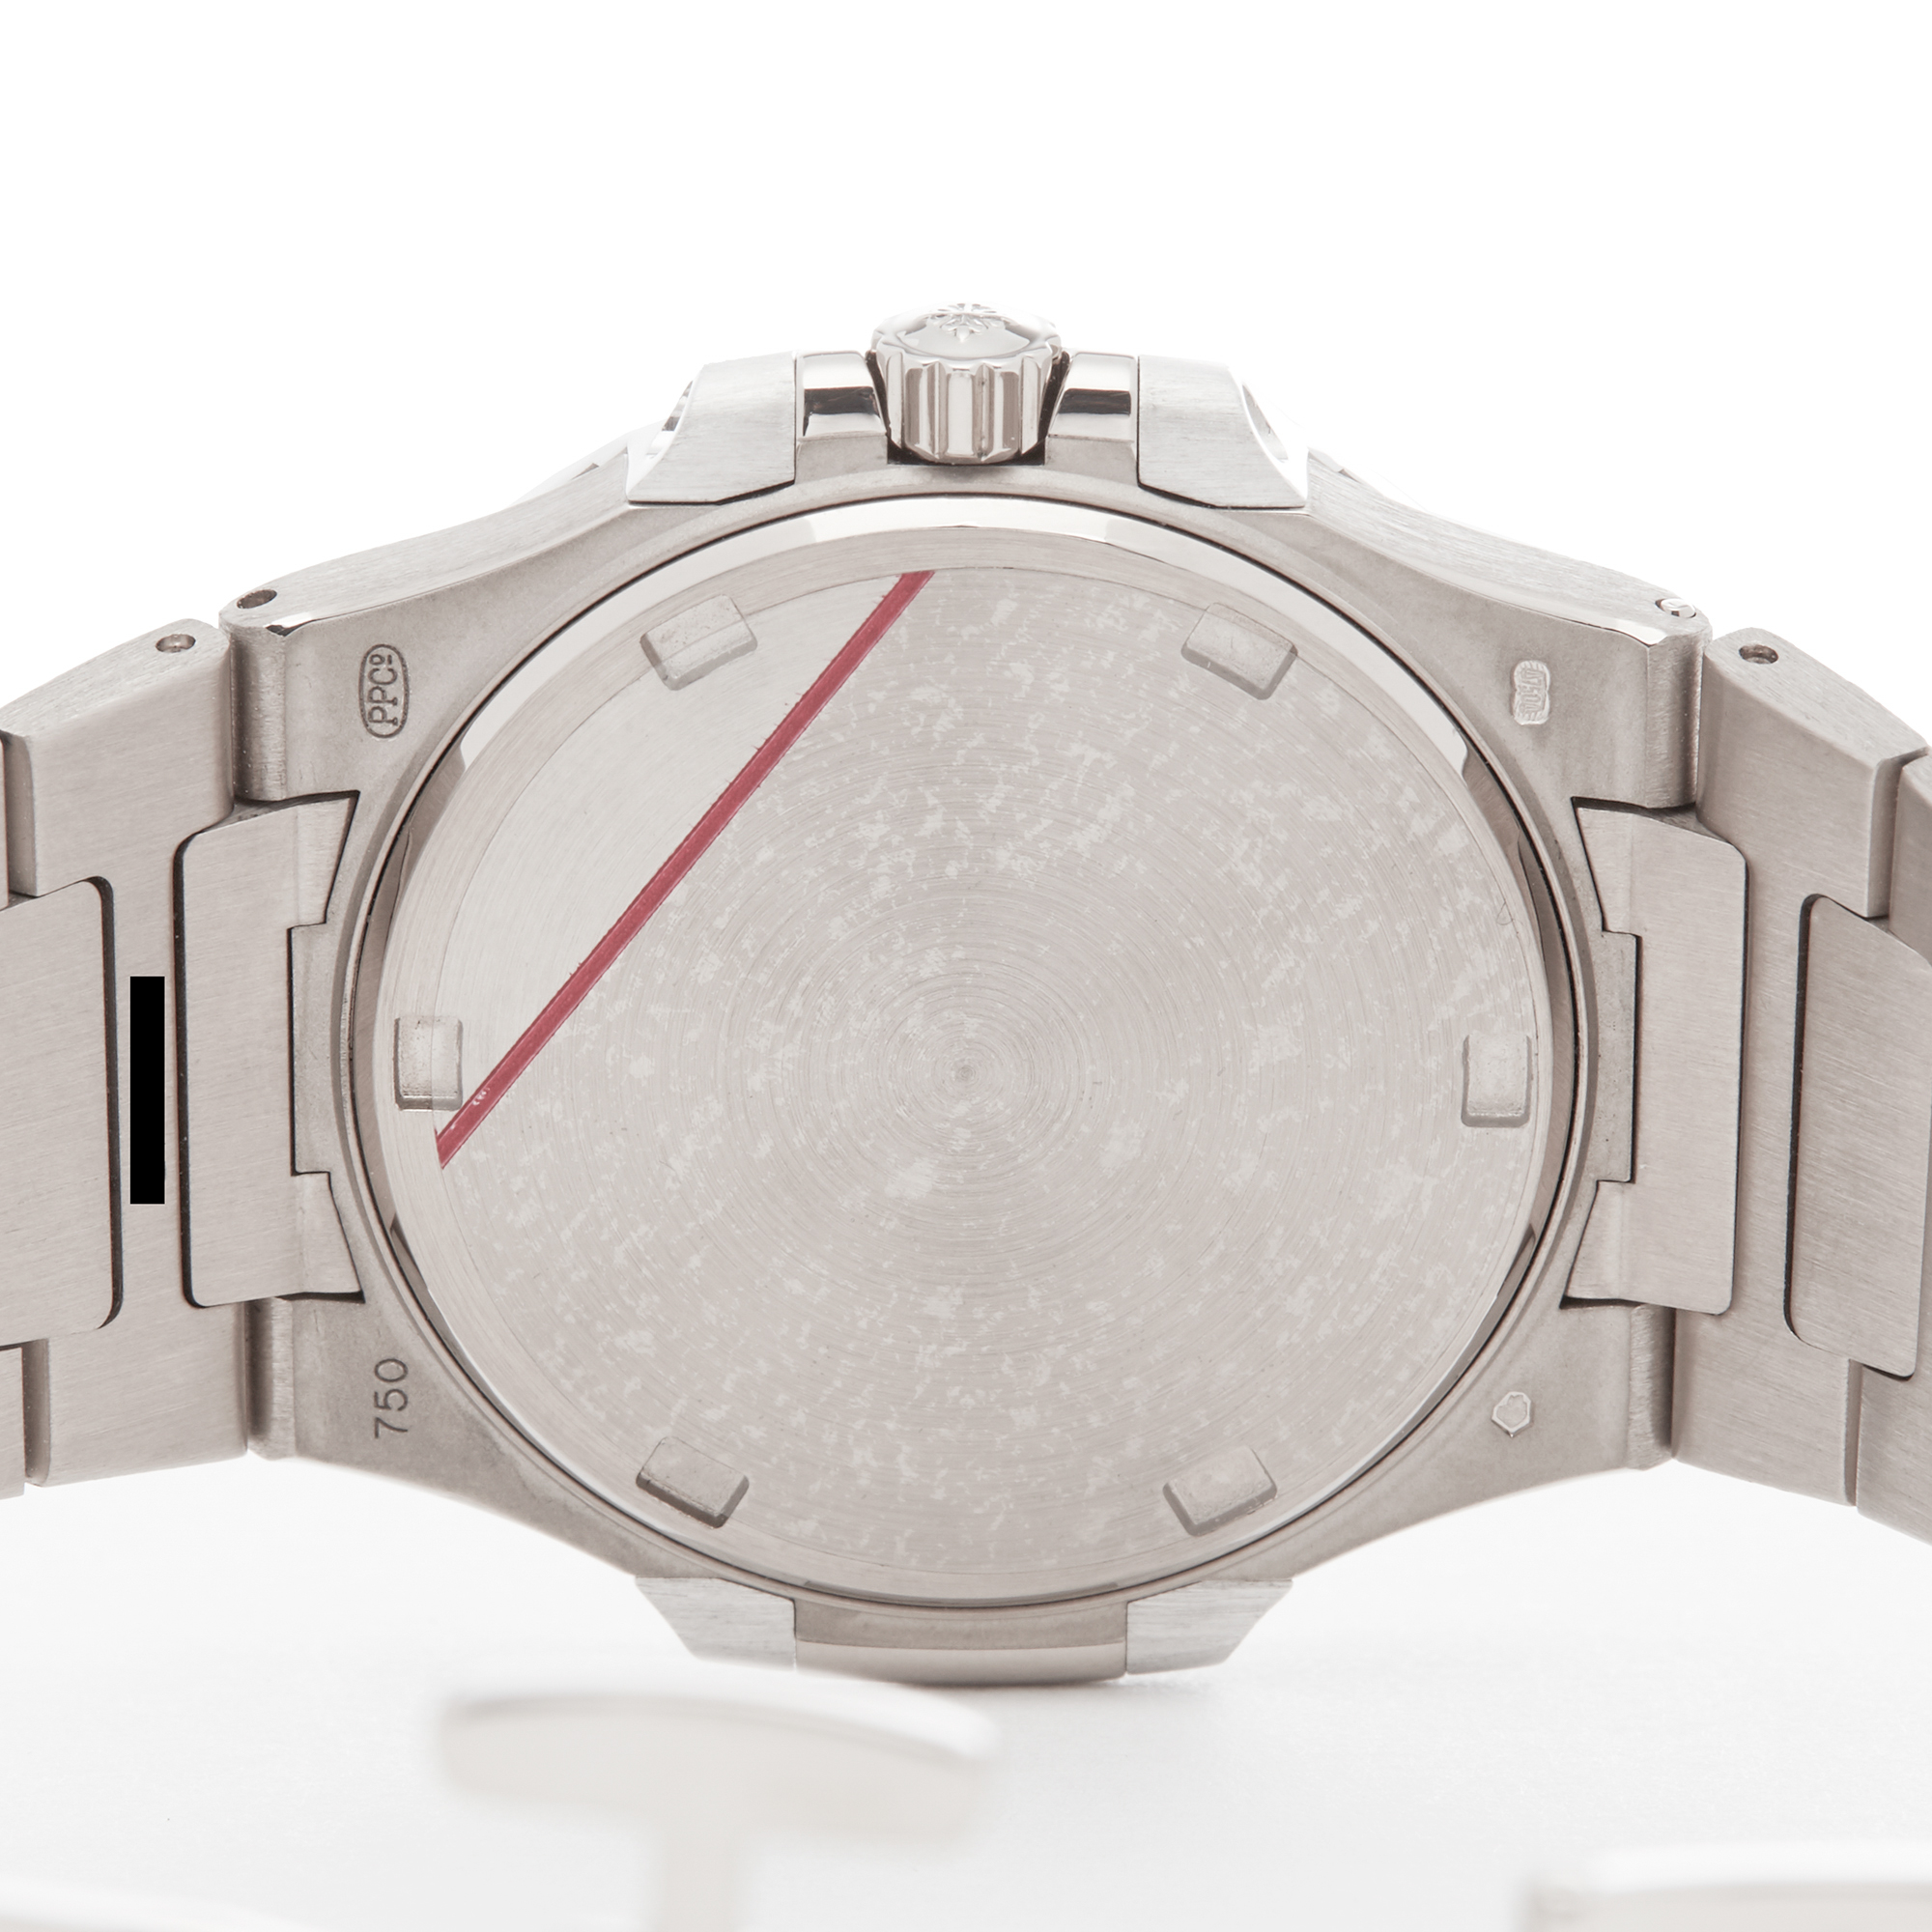 Patek Philippe Nautilus 7010G Ladies White Gold Diamond Watch - Image 4 of 8